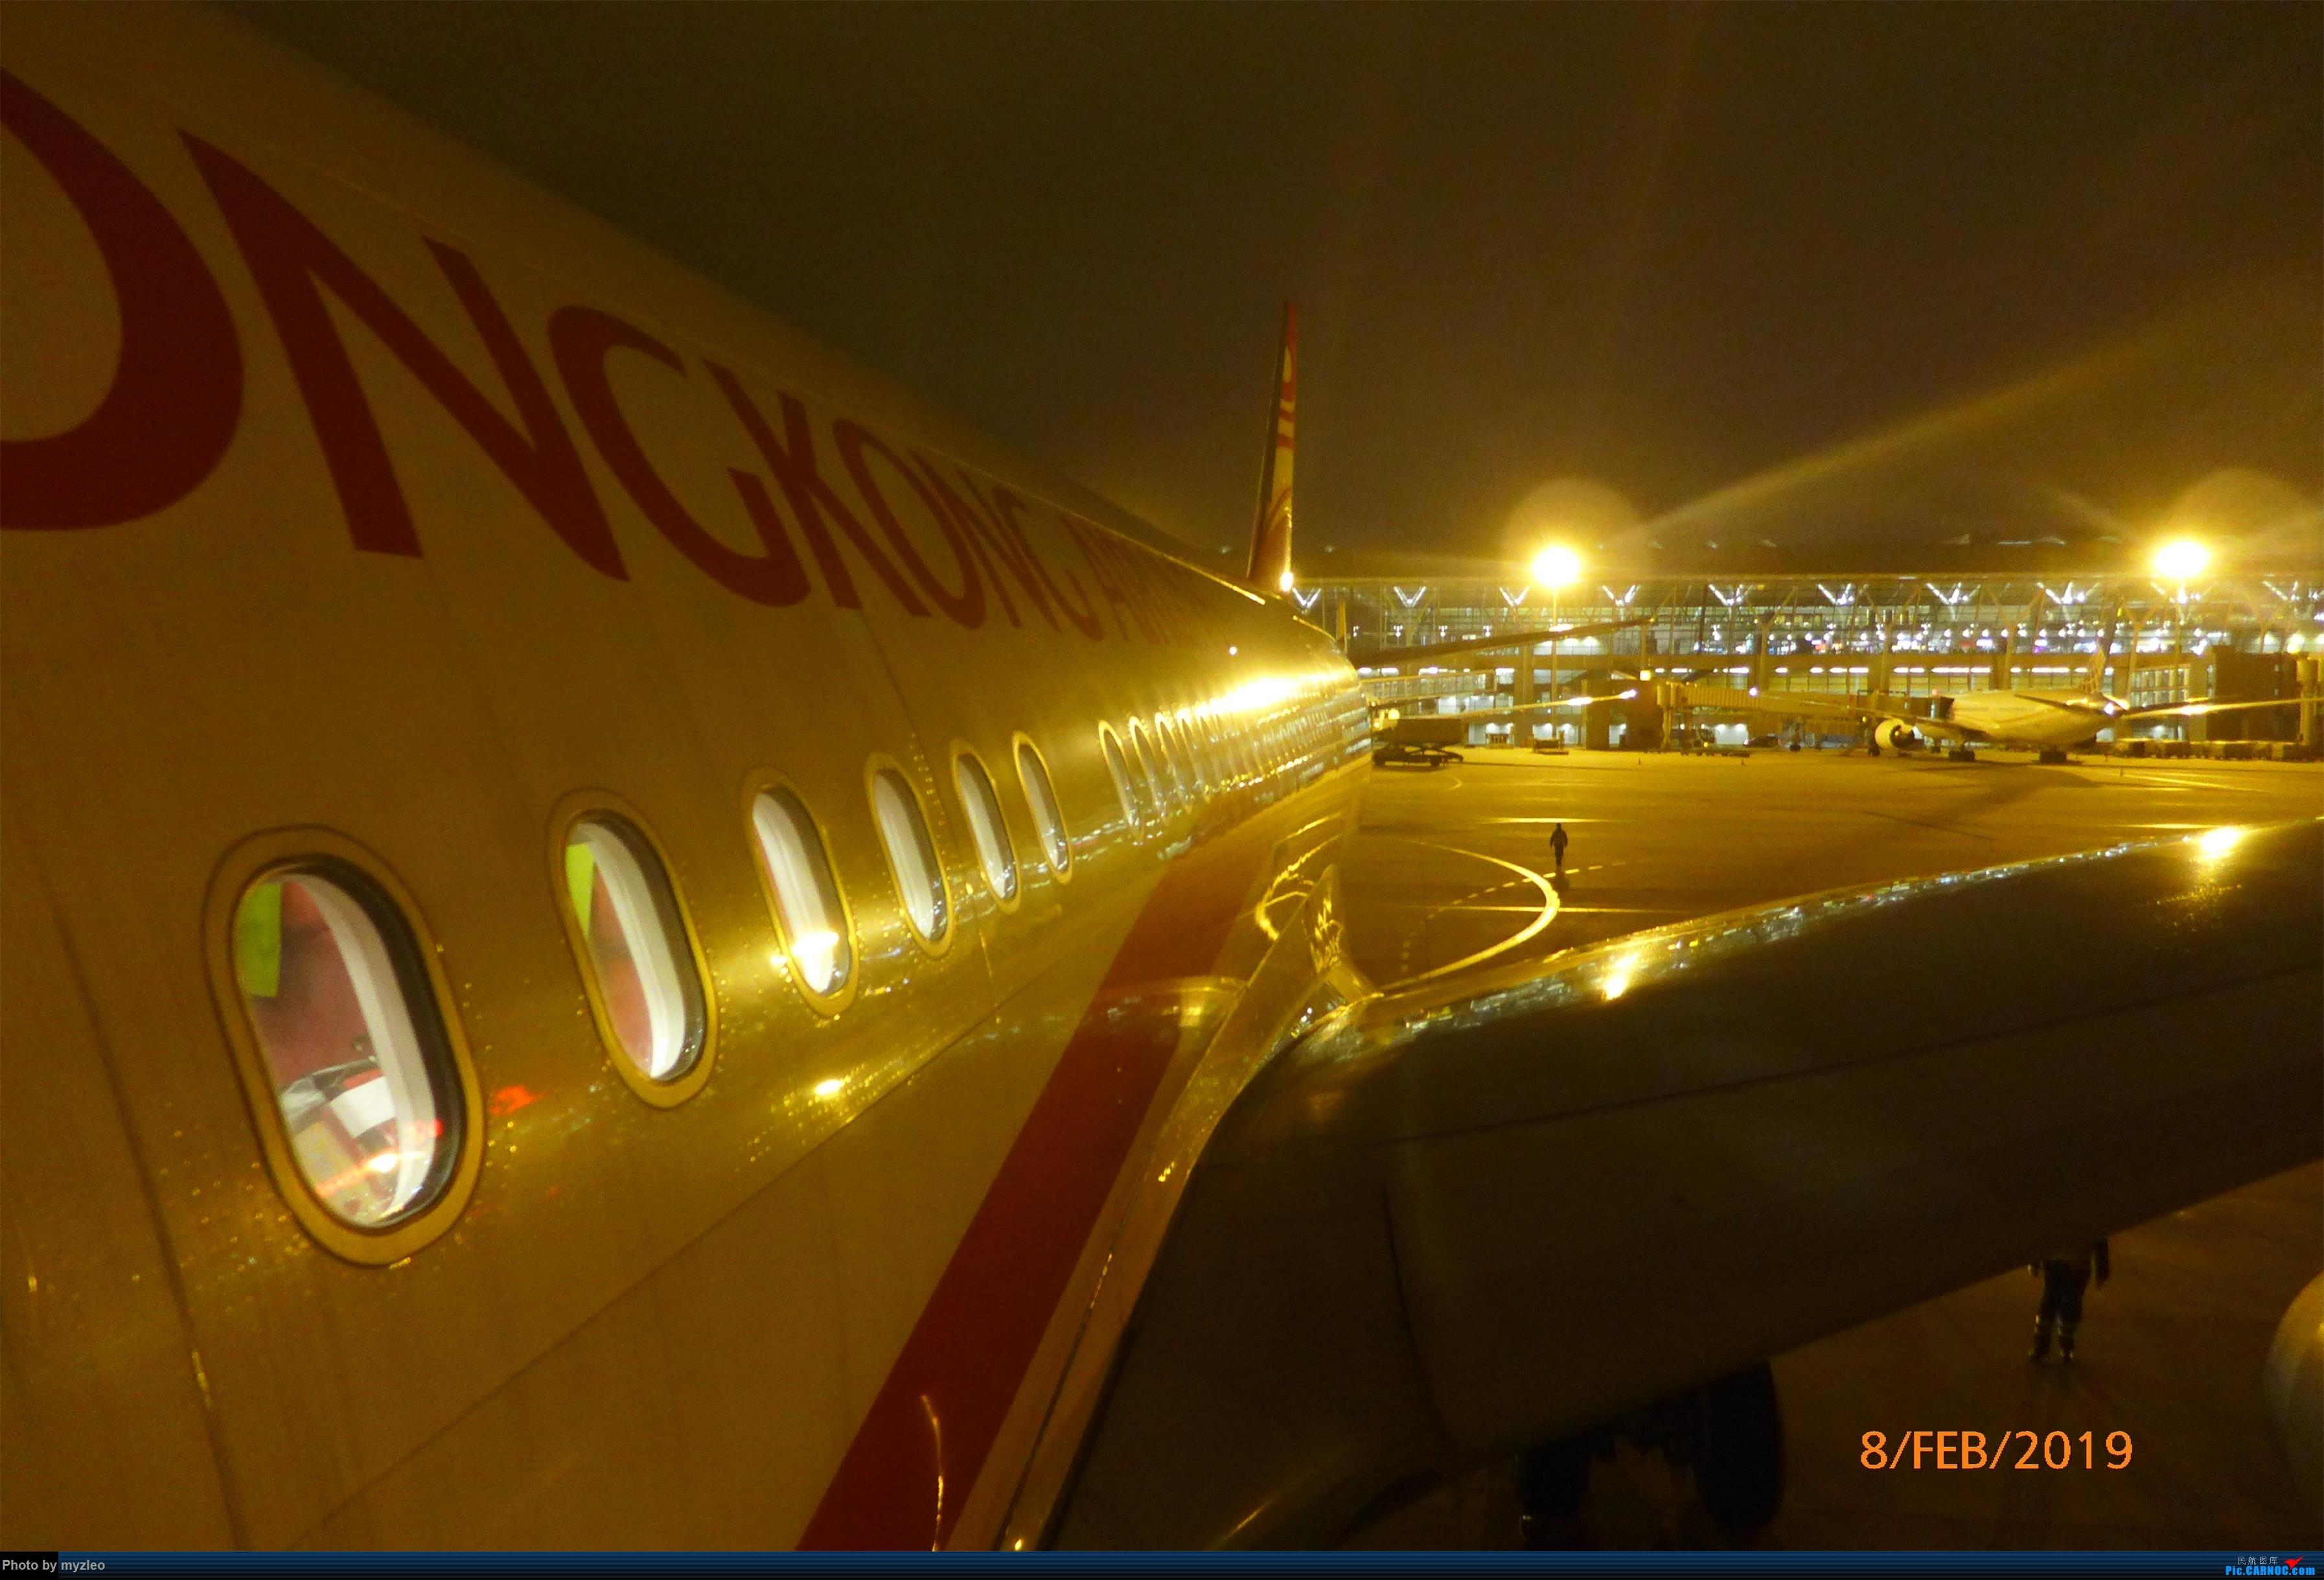 Re:[原创]【myzleo的游记4.5】十年之约(5)在香港的最后一天,搭乘港航333回沪 AIRBUS A330-300 B-LNQ 中国上海浦东国际机场